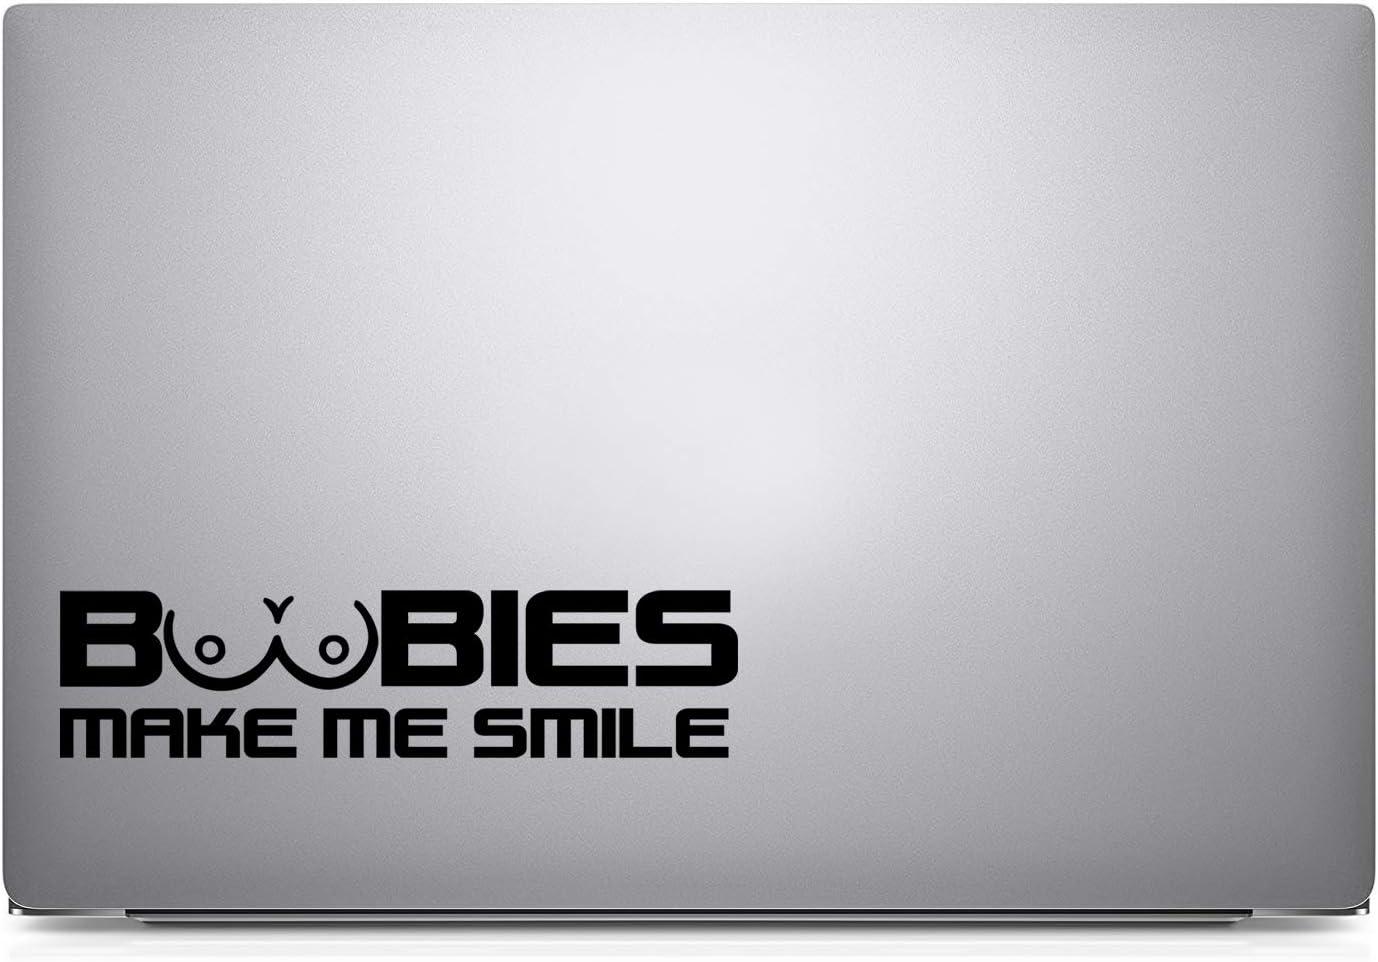 Crawford Graphix Boobies Make Me Smile Rude Funny Symbol Funny Bumper Car Van Bike Sticker Decal 6, Black